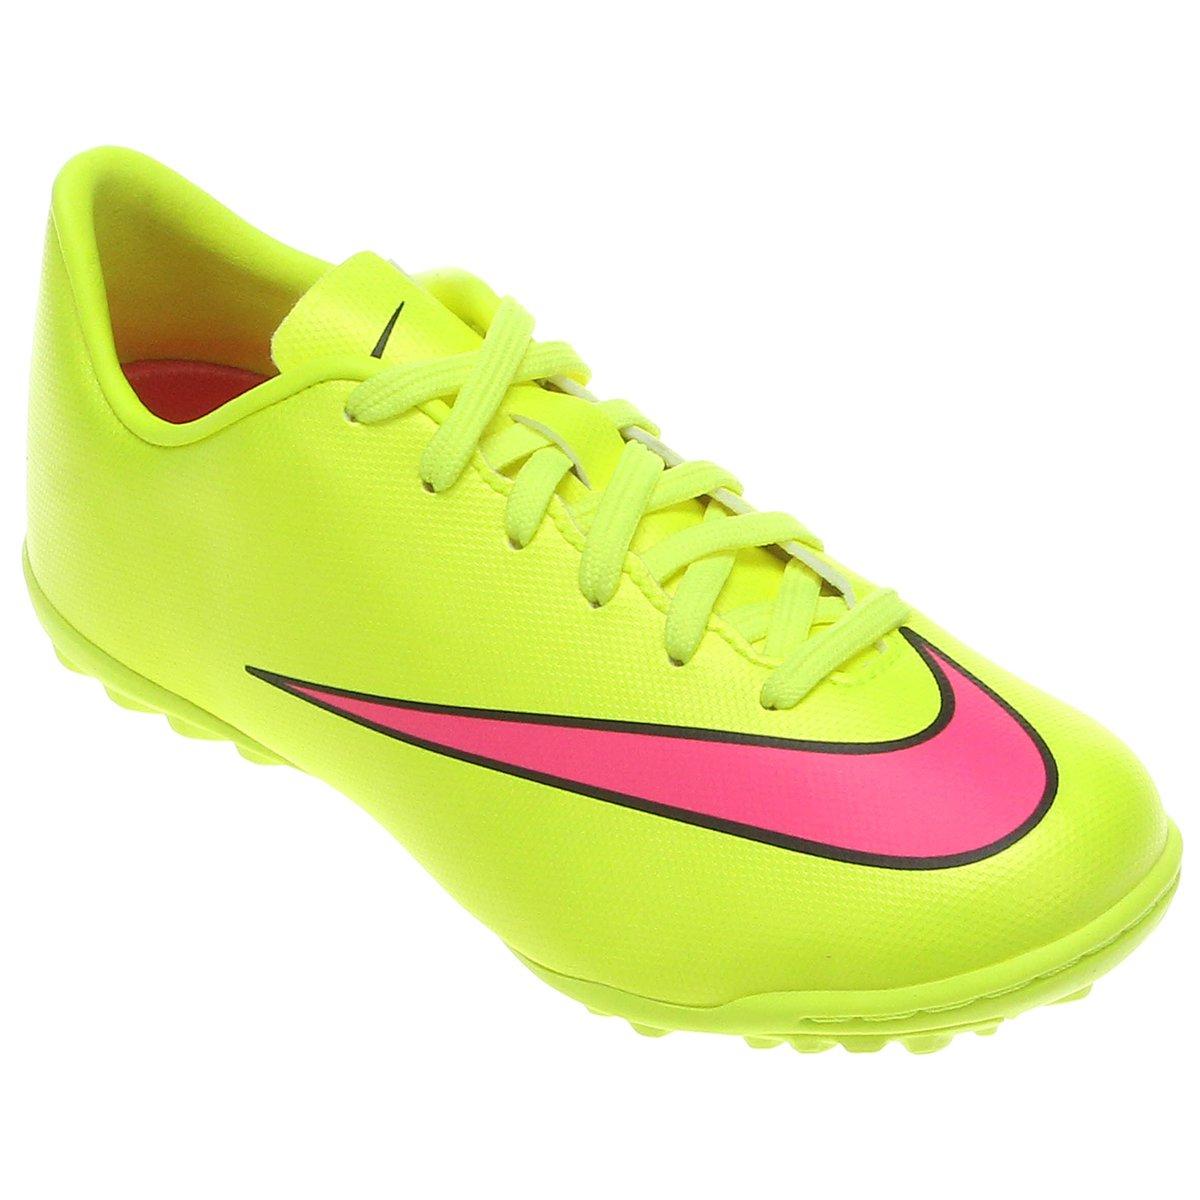 Chuteira Nike Mercurial Victory 5 TF Society Infantil - Compre Agora ... a36a7dc94ac60